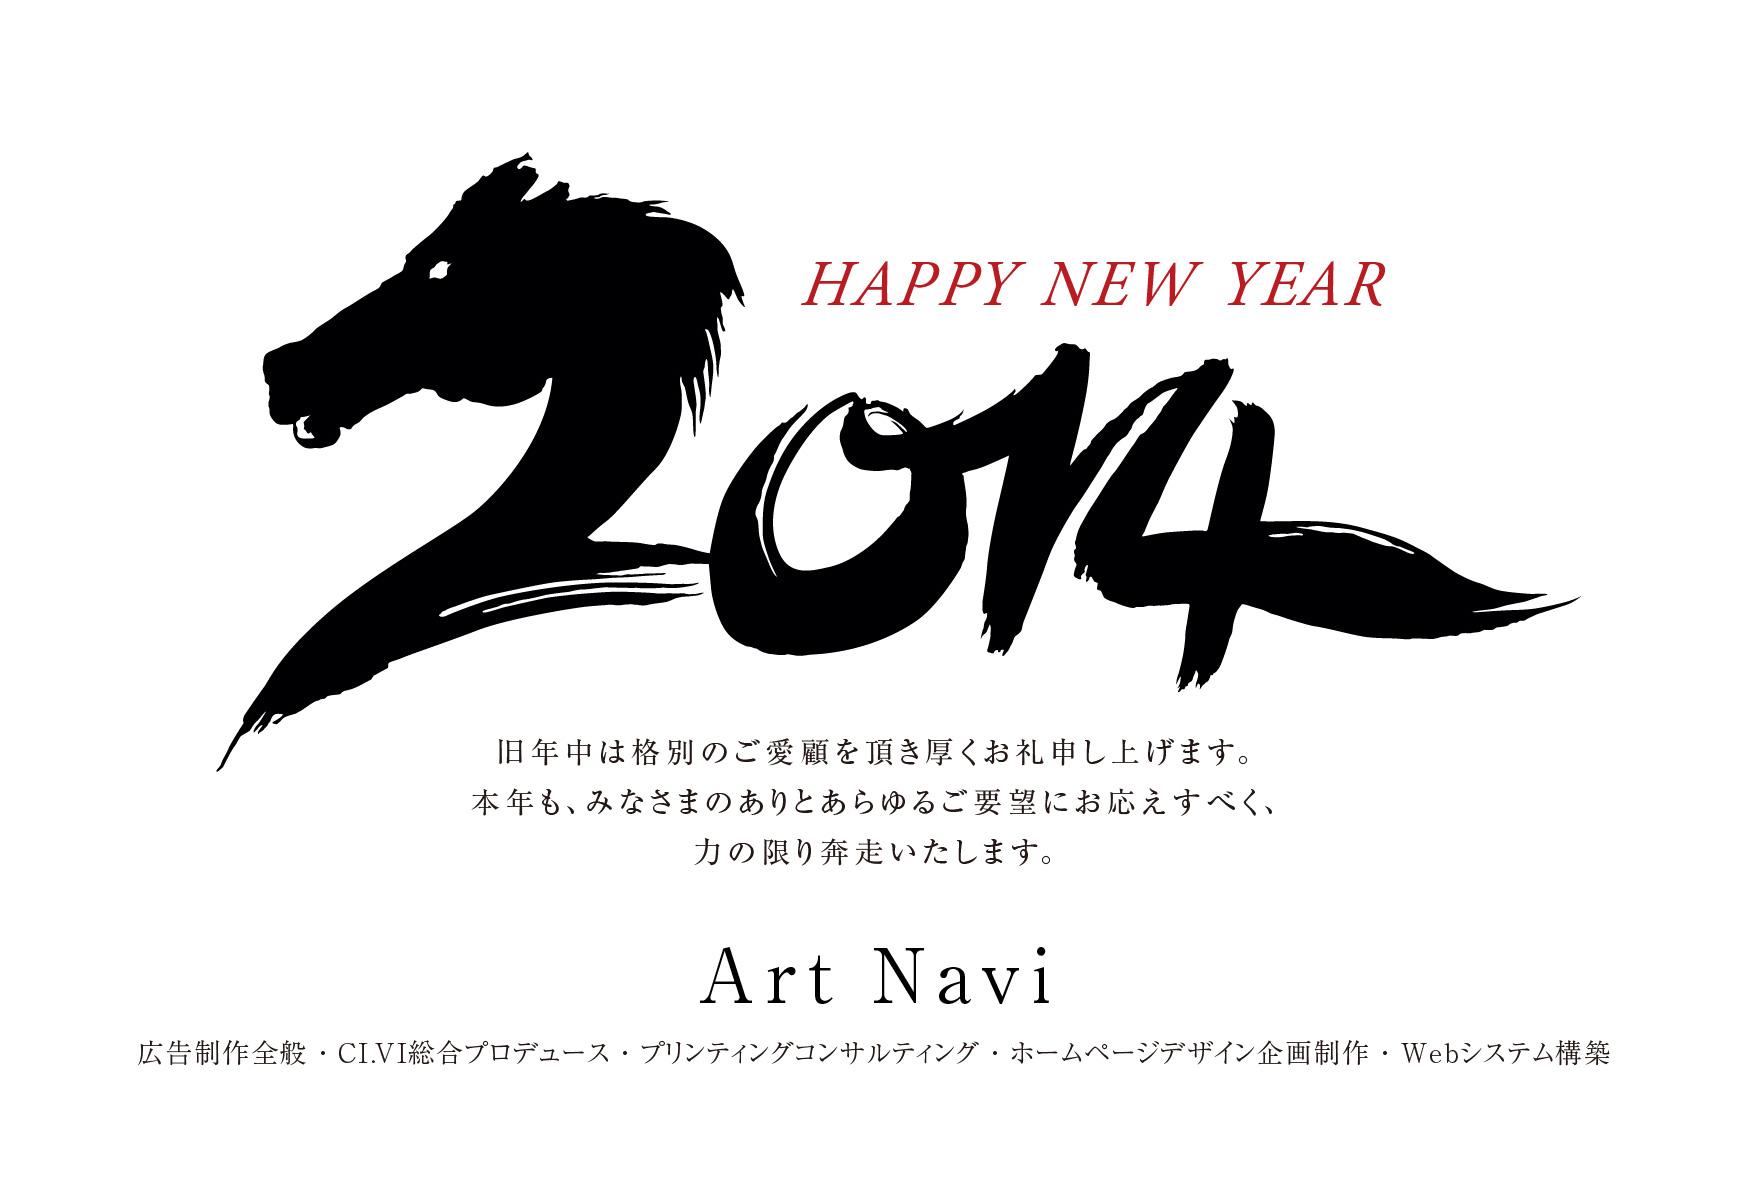 ArtNavi年賀状デザイン02